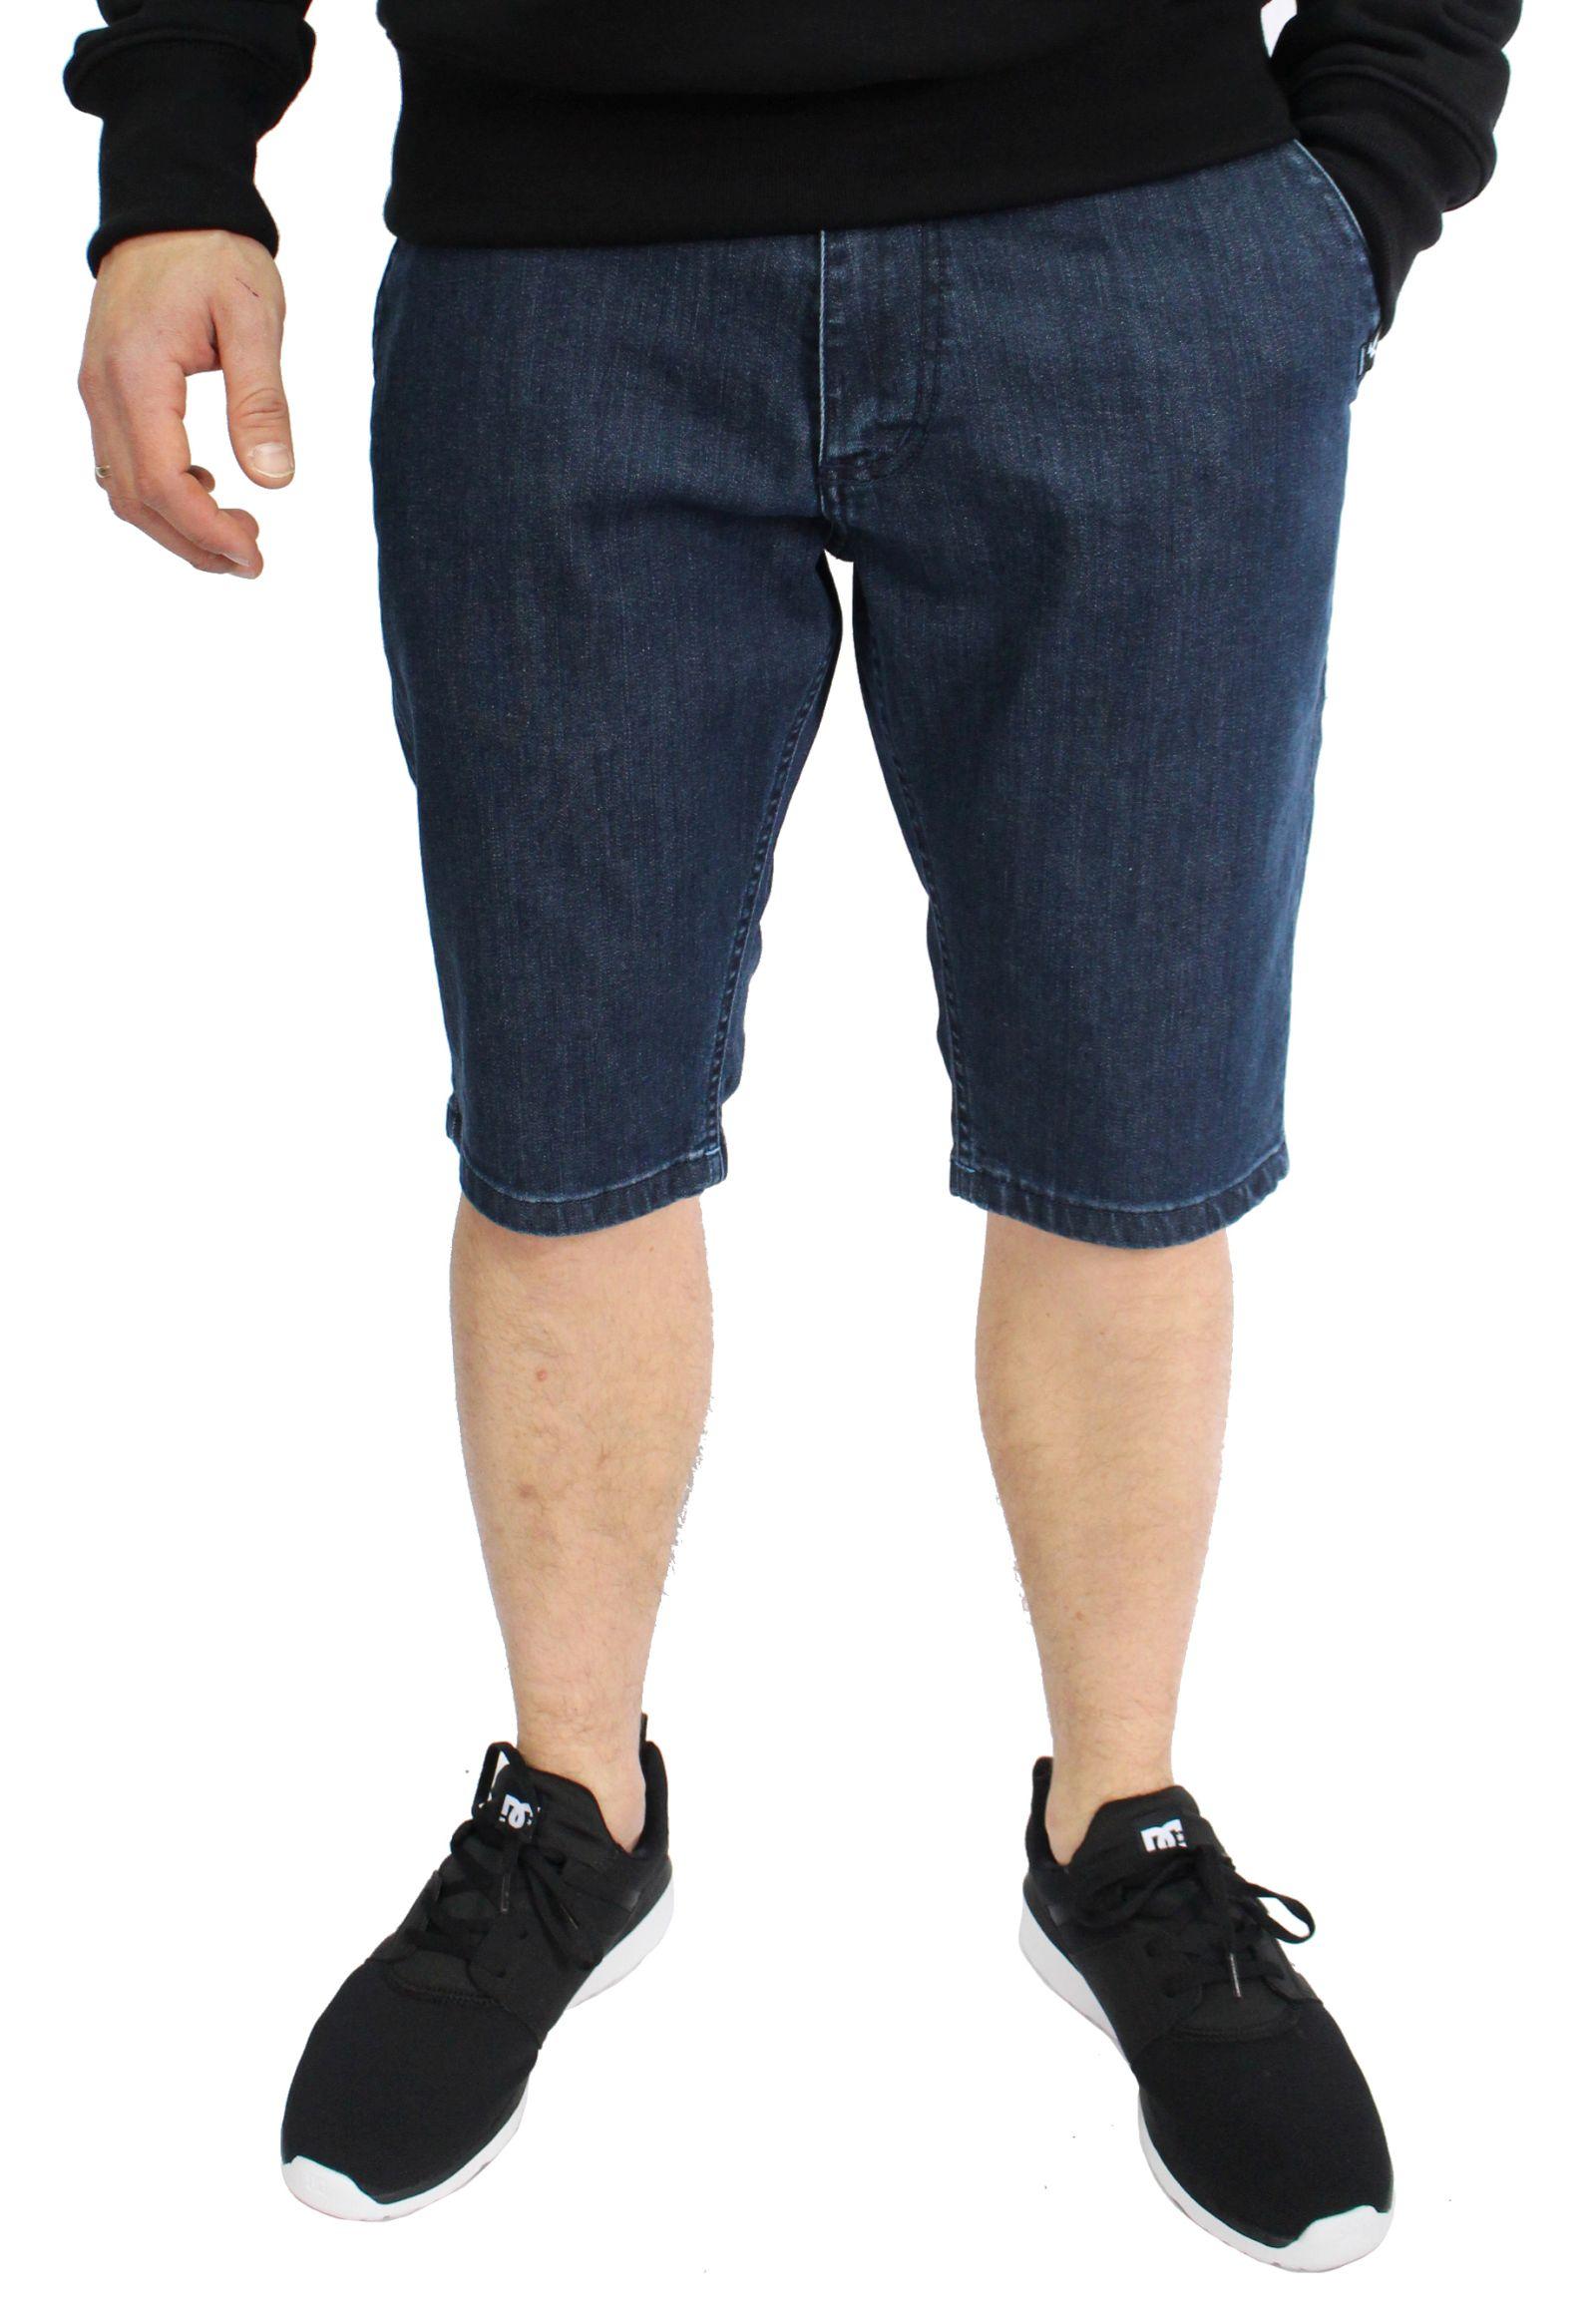 Szorty Nervous Sp16 Jeans (Indygo)